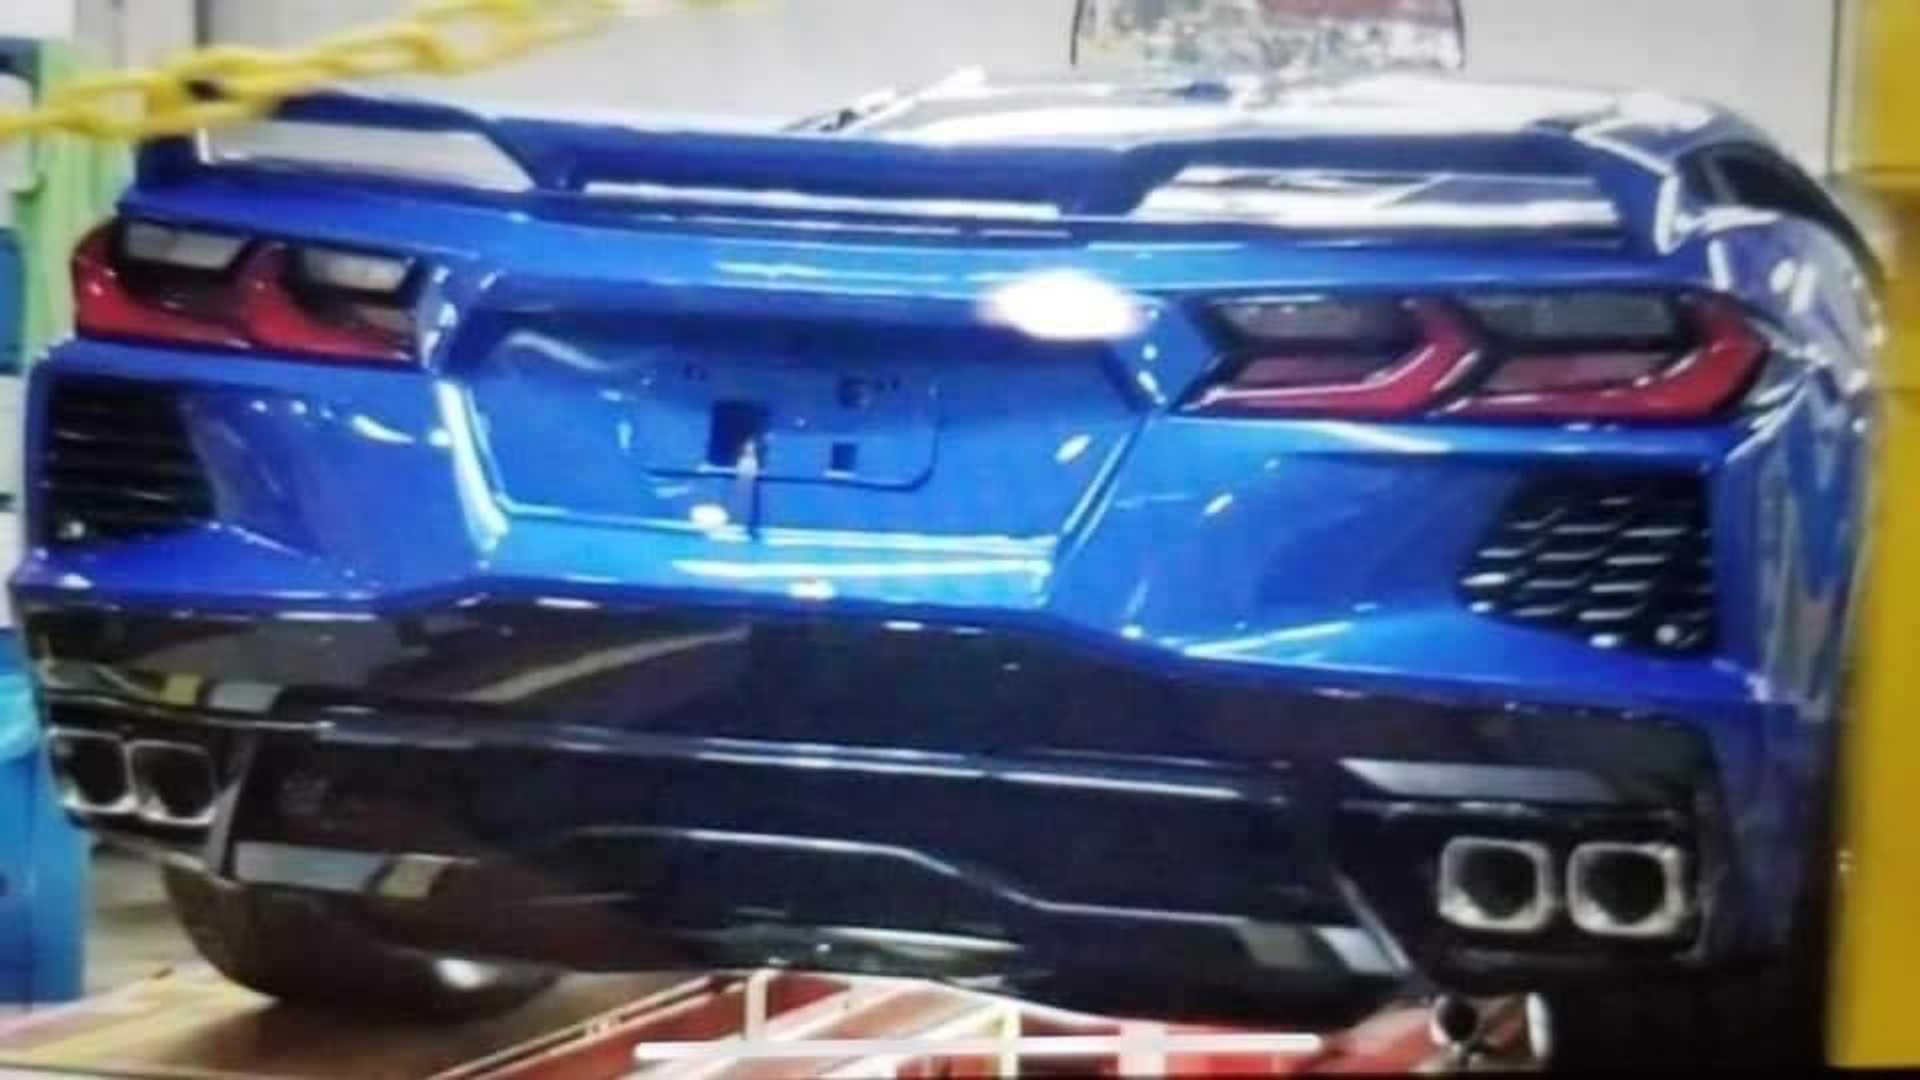 ¡Bombazo! Así es la trasera del nuevo Chevrolet Corvette